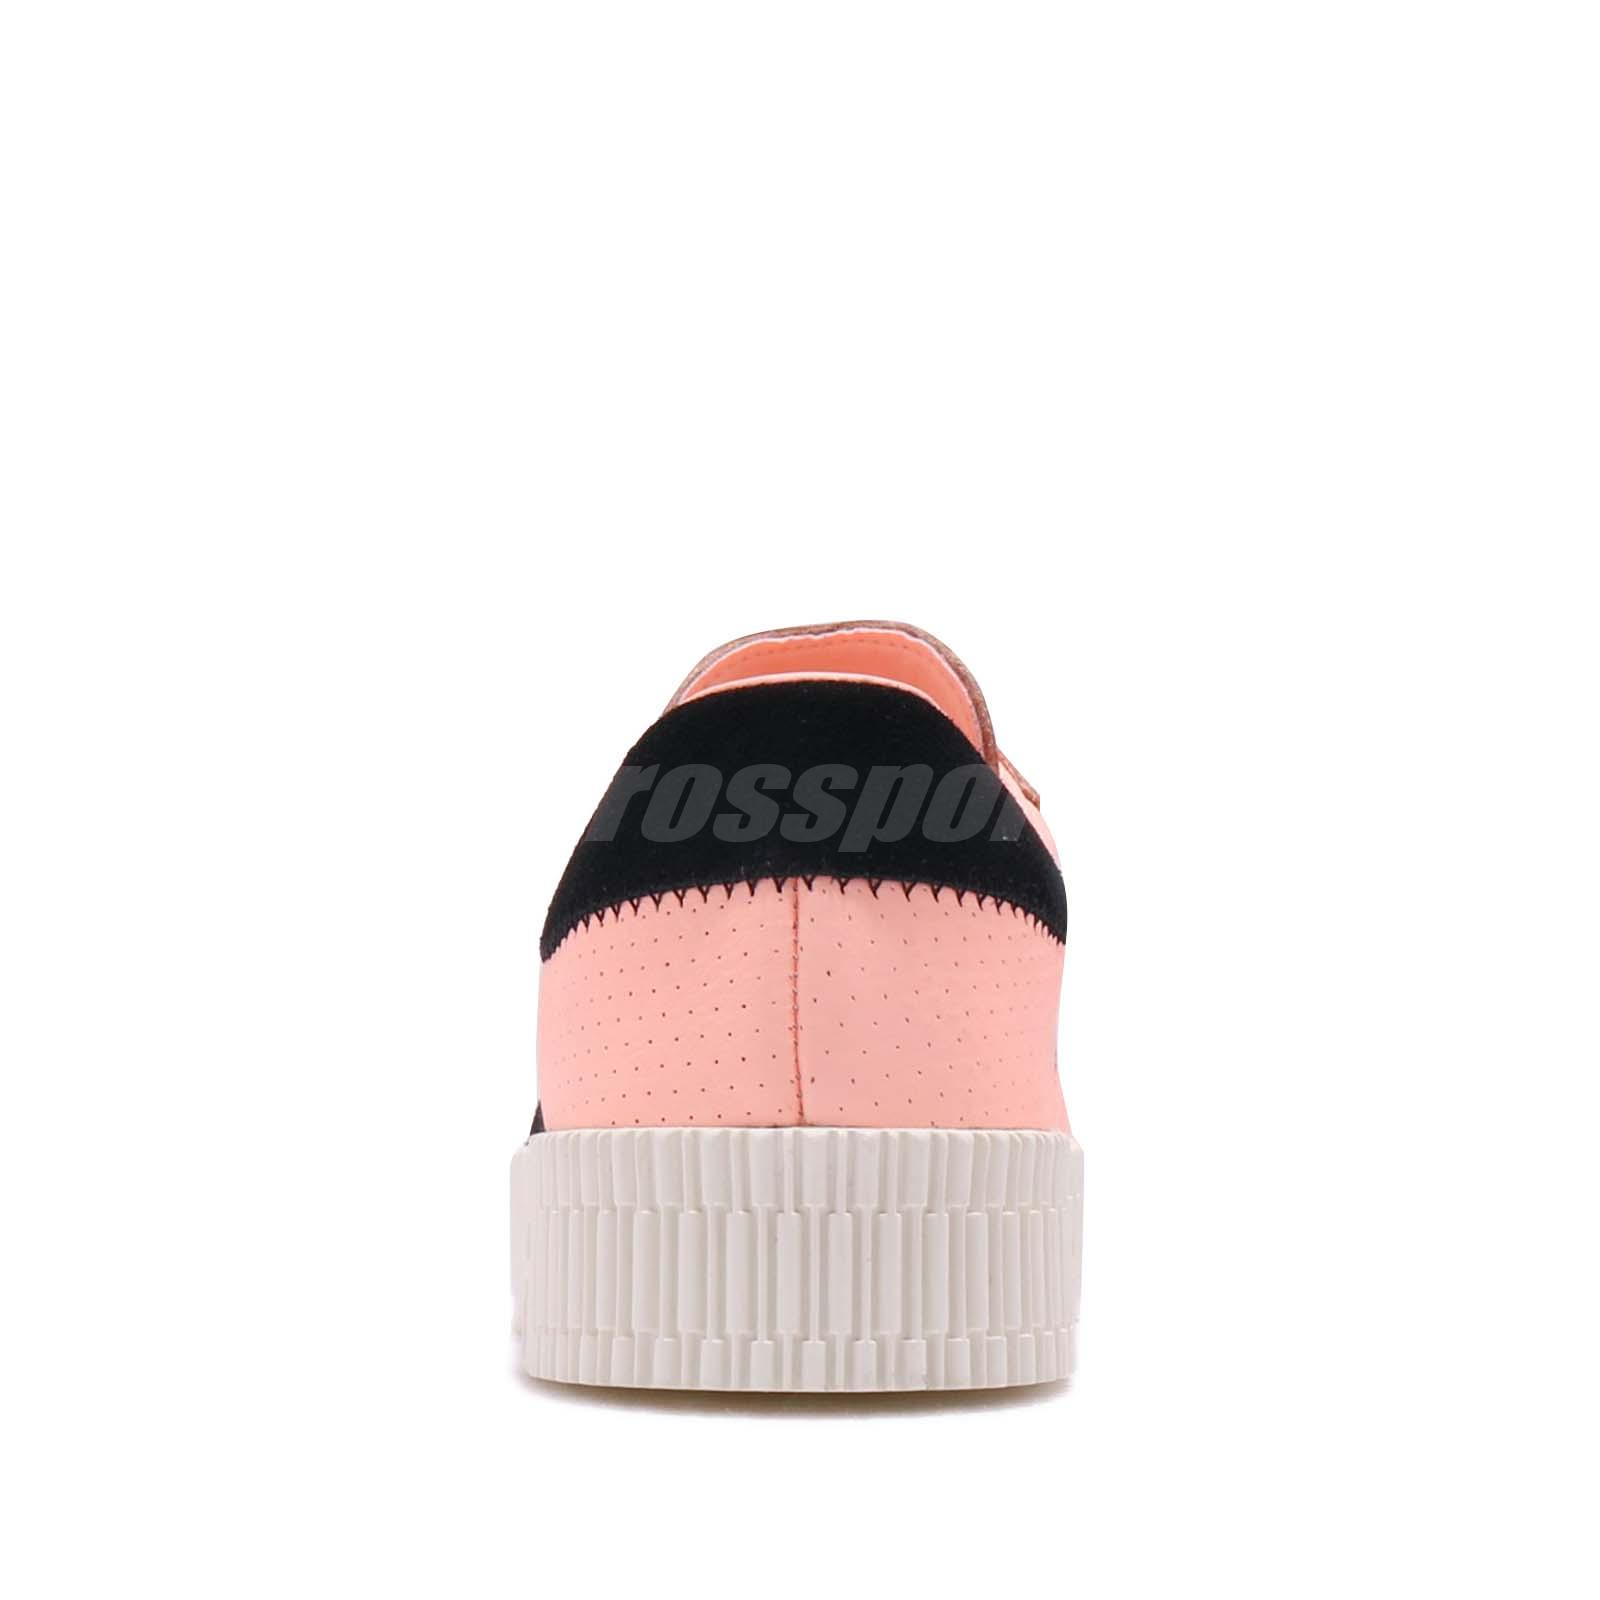 73187999dc9 adidas Originals Sambarose W Orange Black Off White Women Platform ...